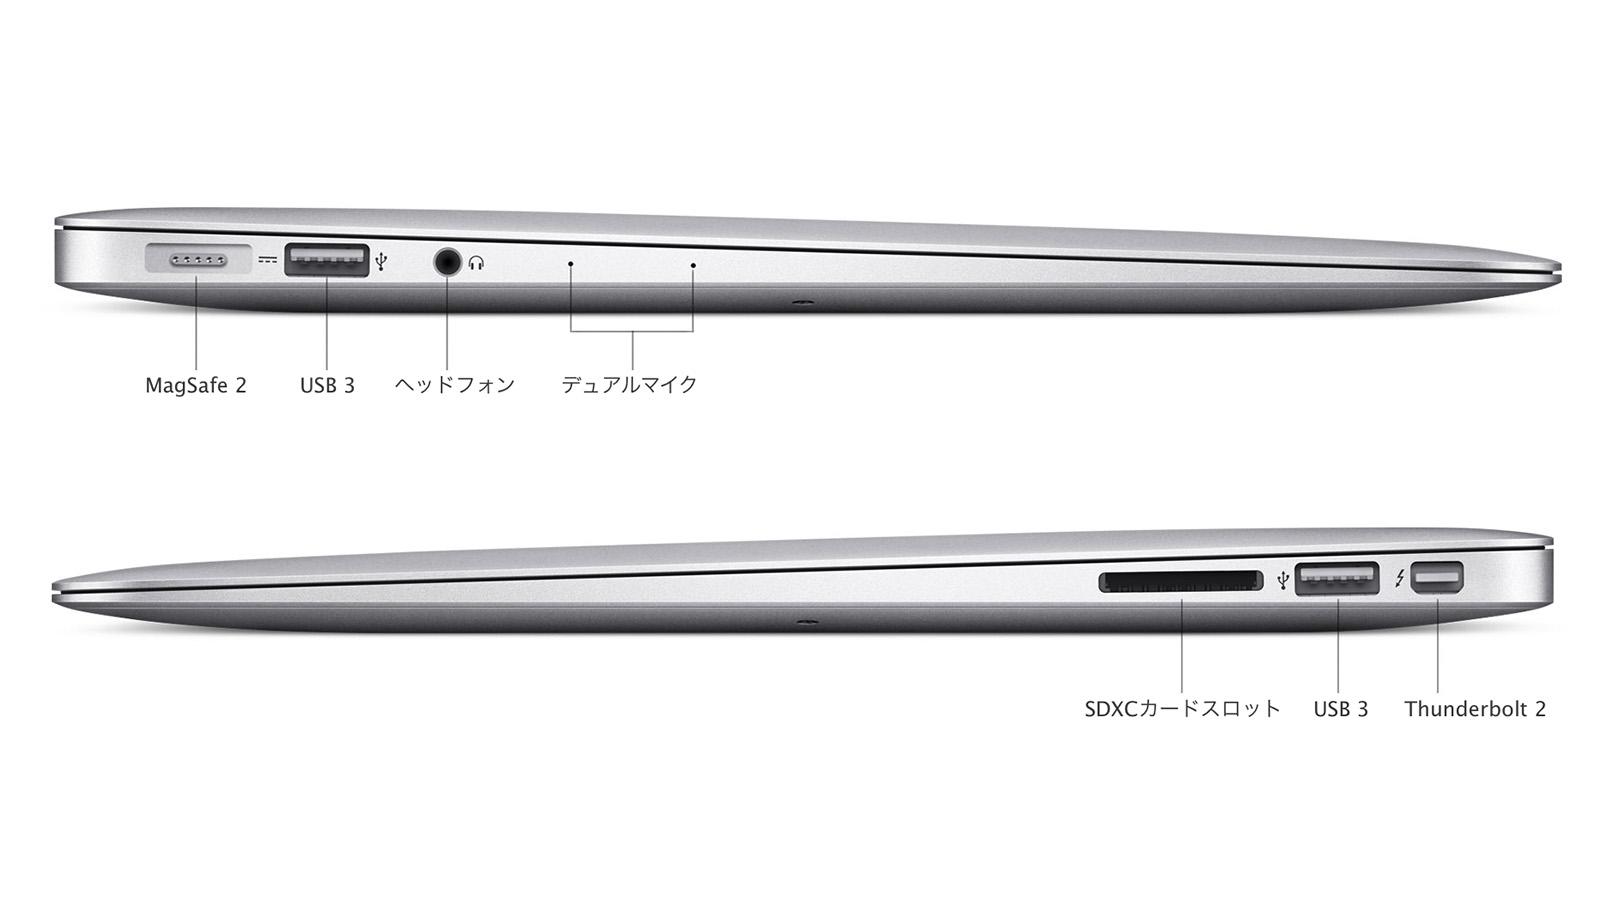 MacBook Air 拡張端子